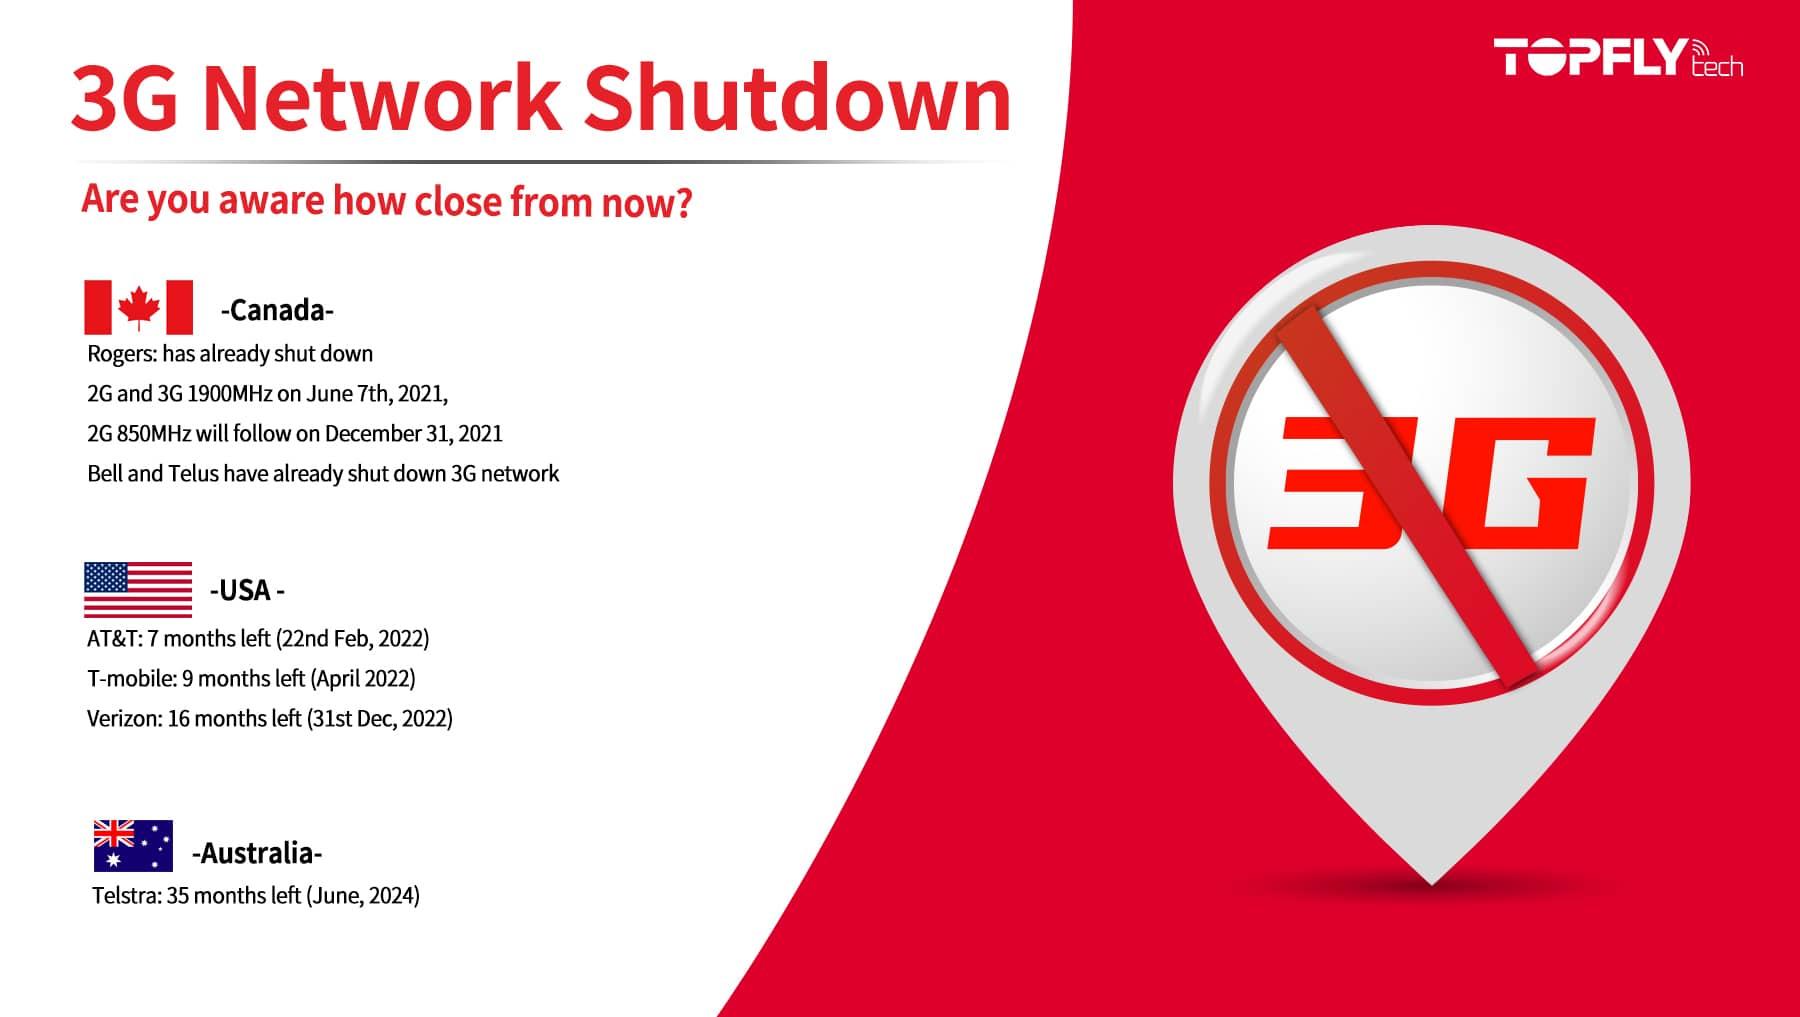 3G is closing